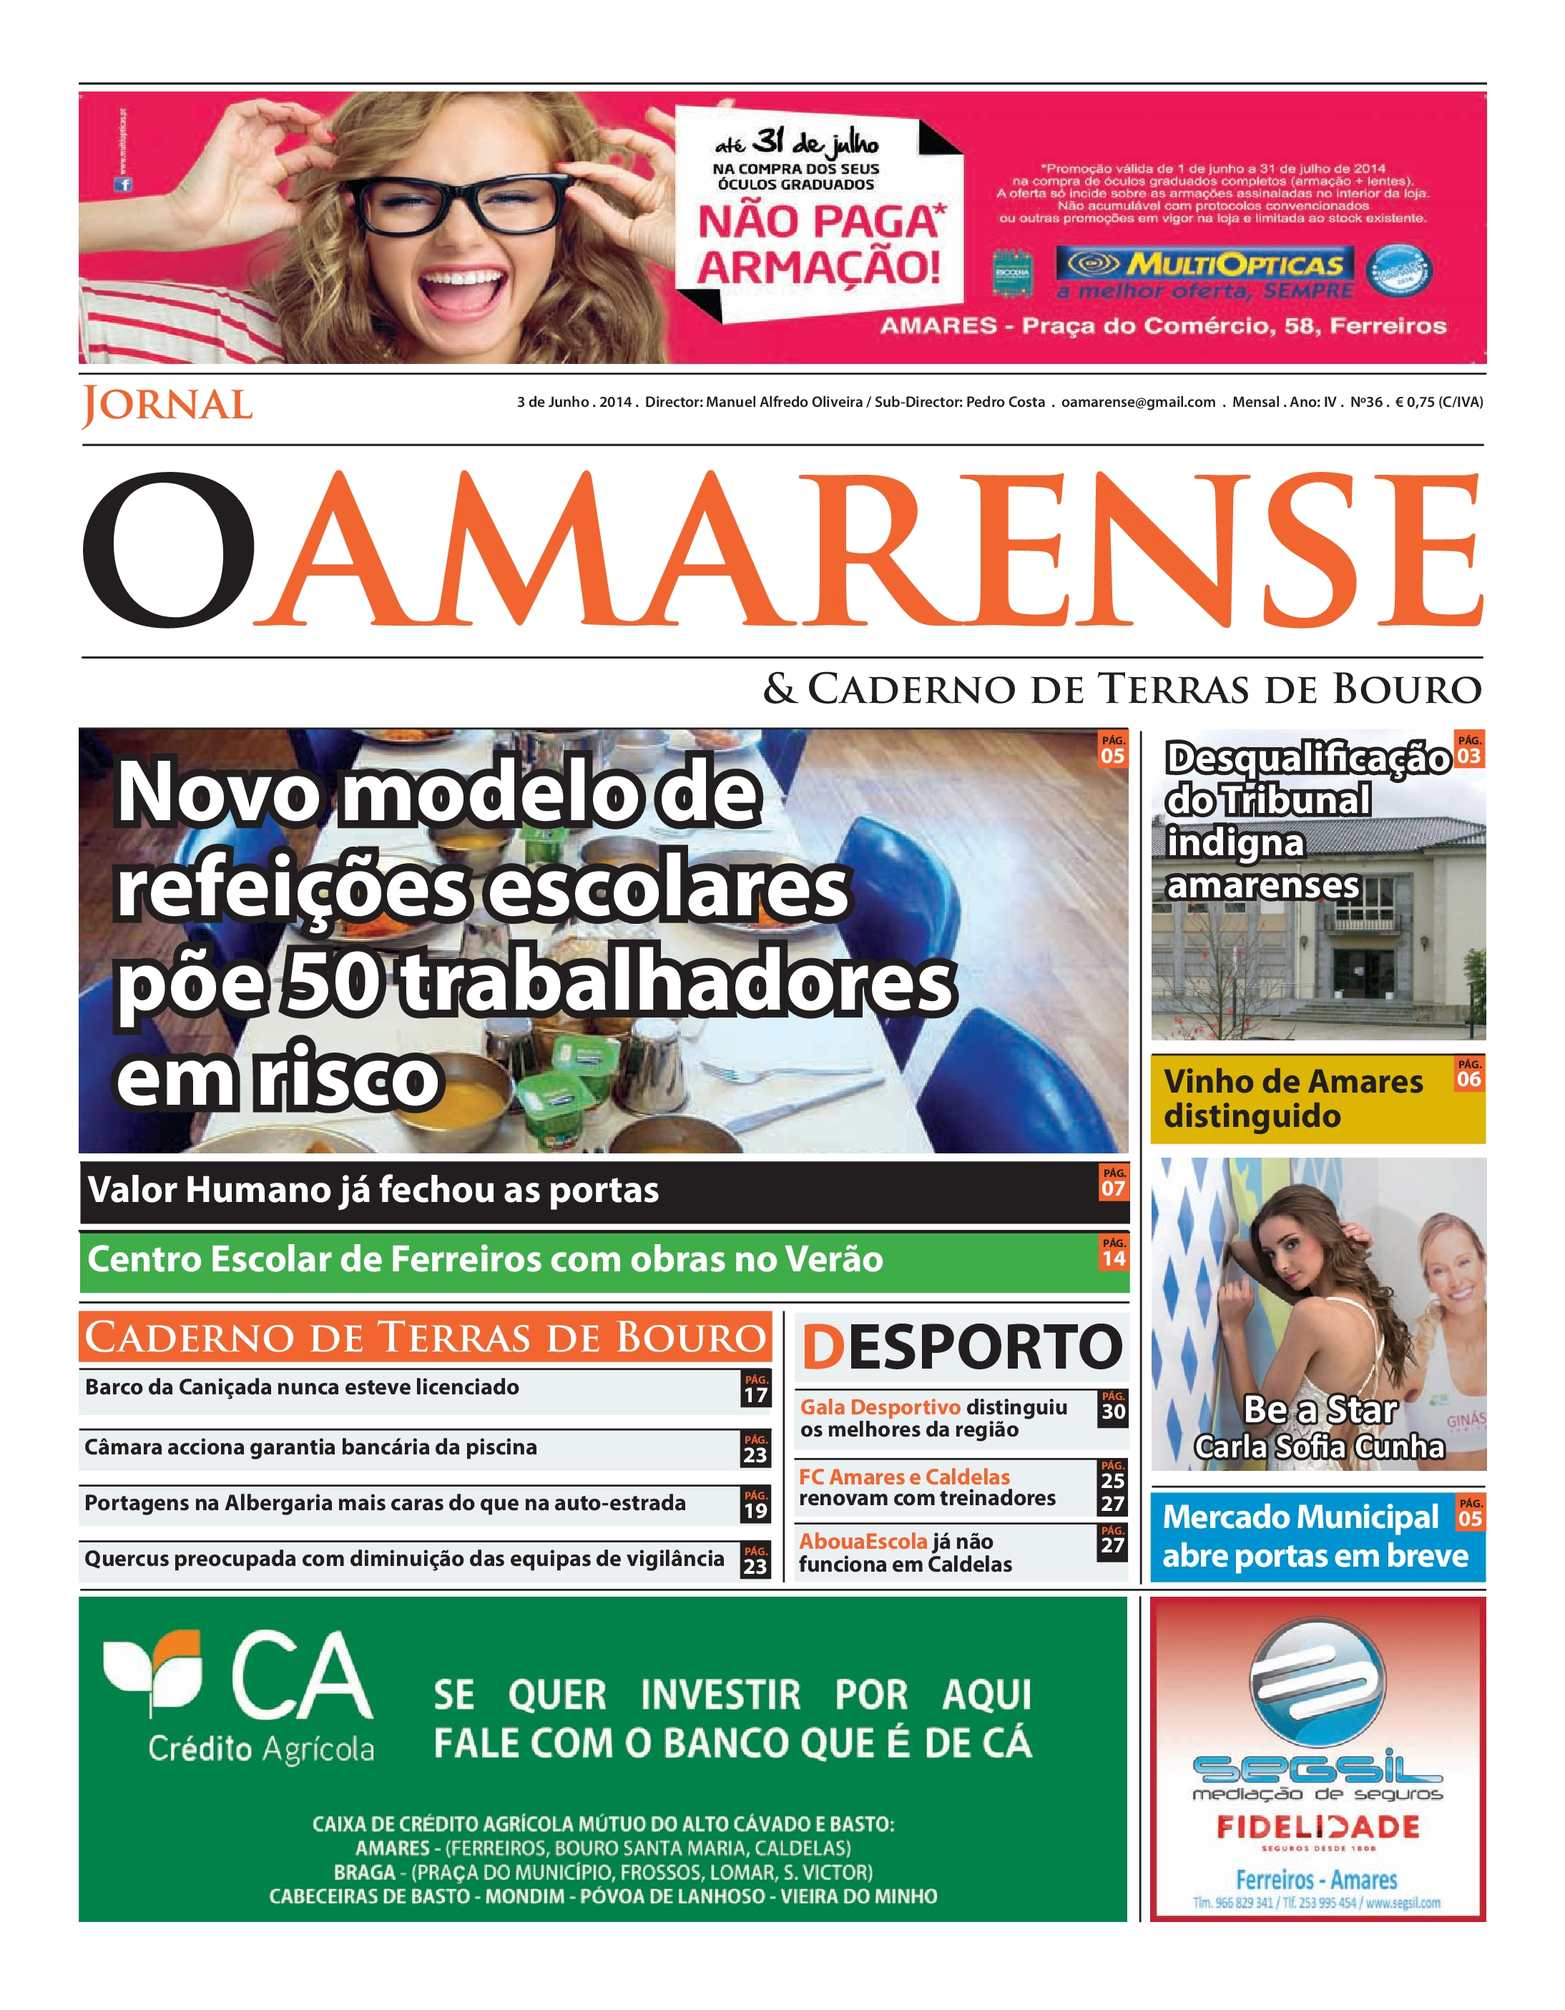 Calaméo - O Amarense JUNHO 2014 Web 0cfa4caca3